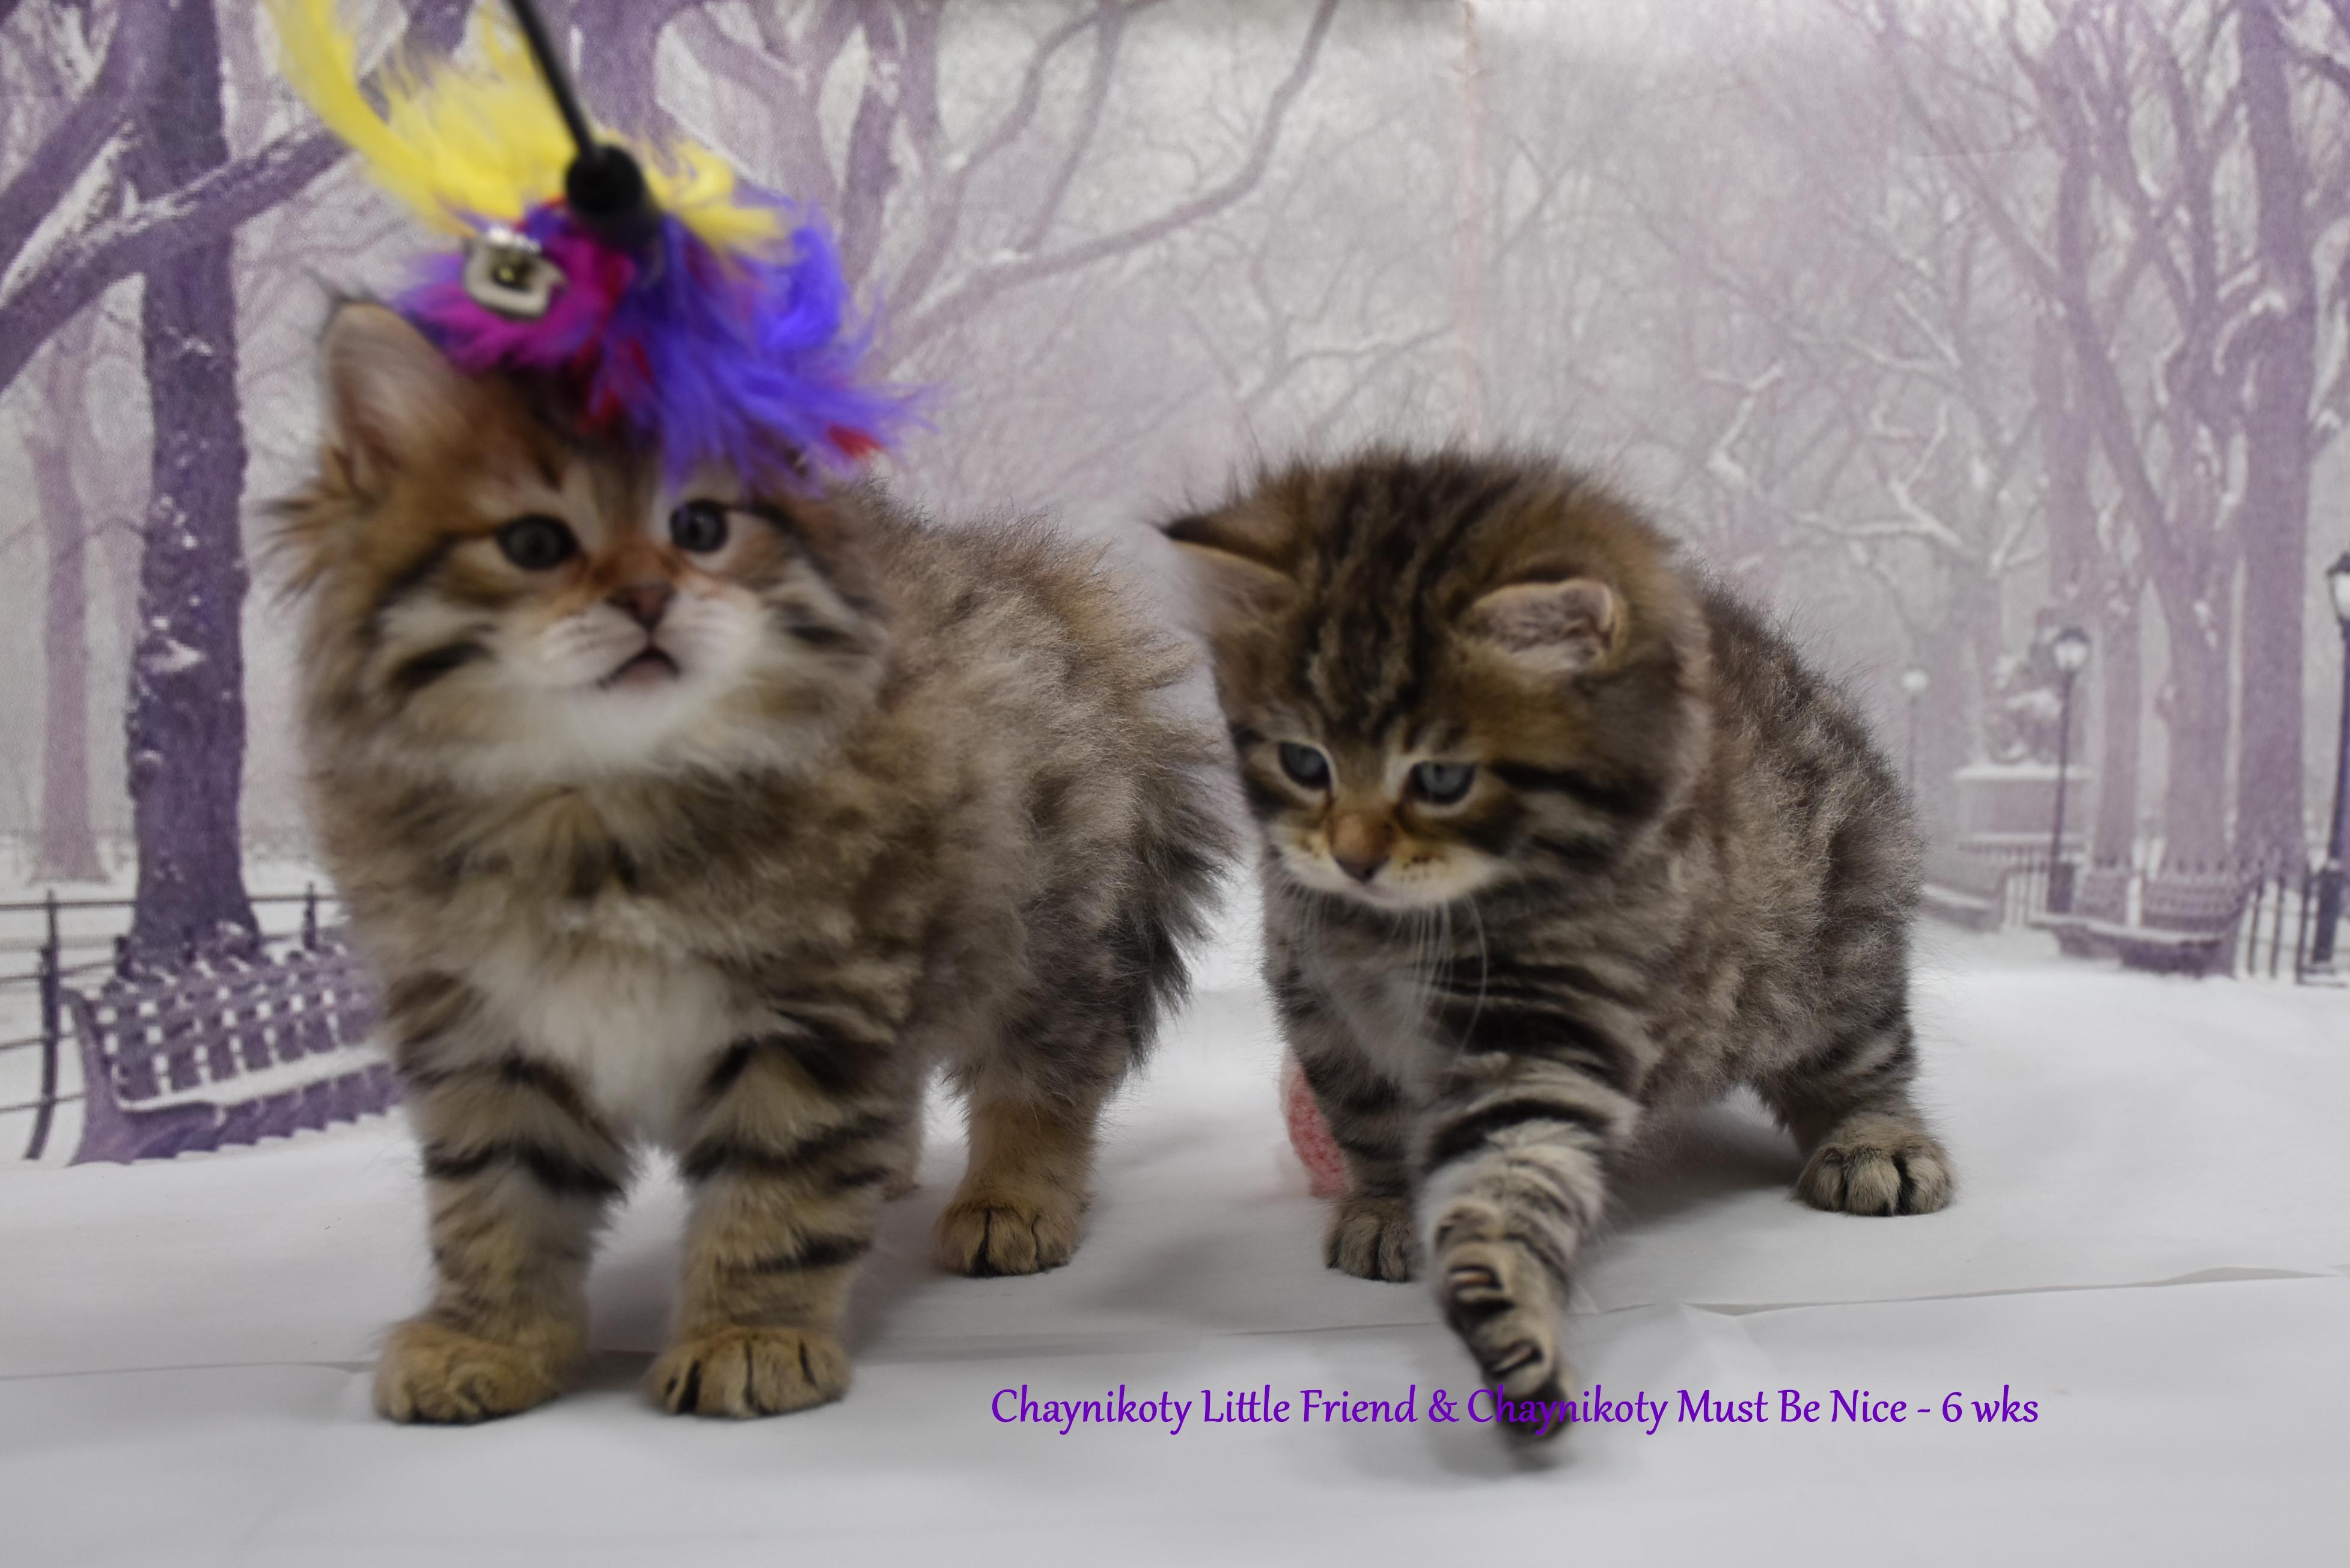 Chaynikoty Little Friend & Chaynikoty Mu